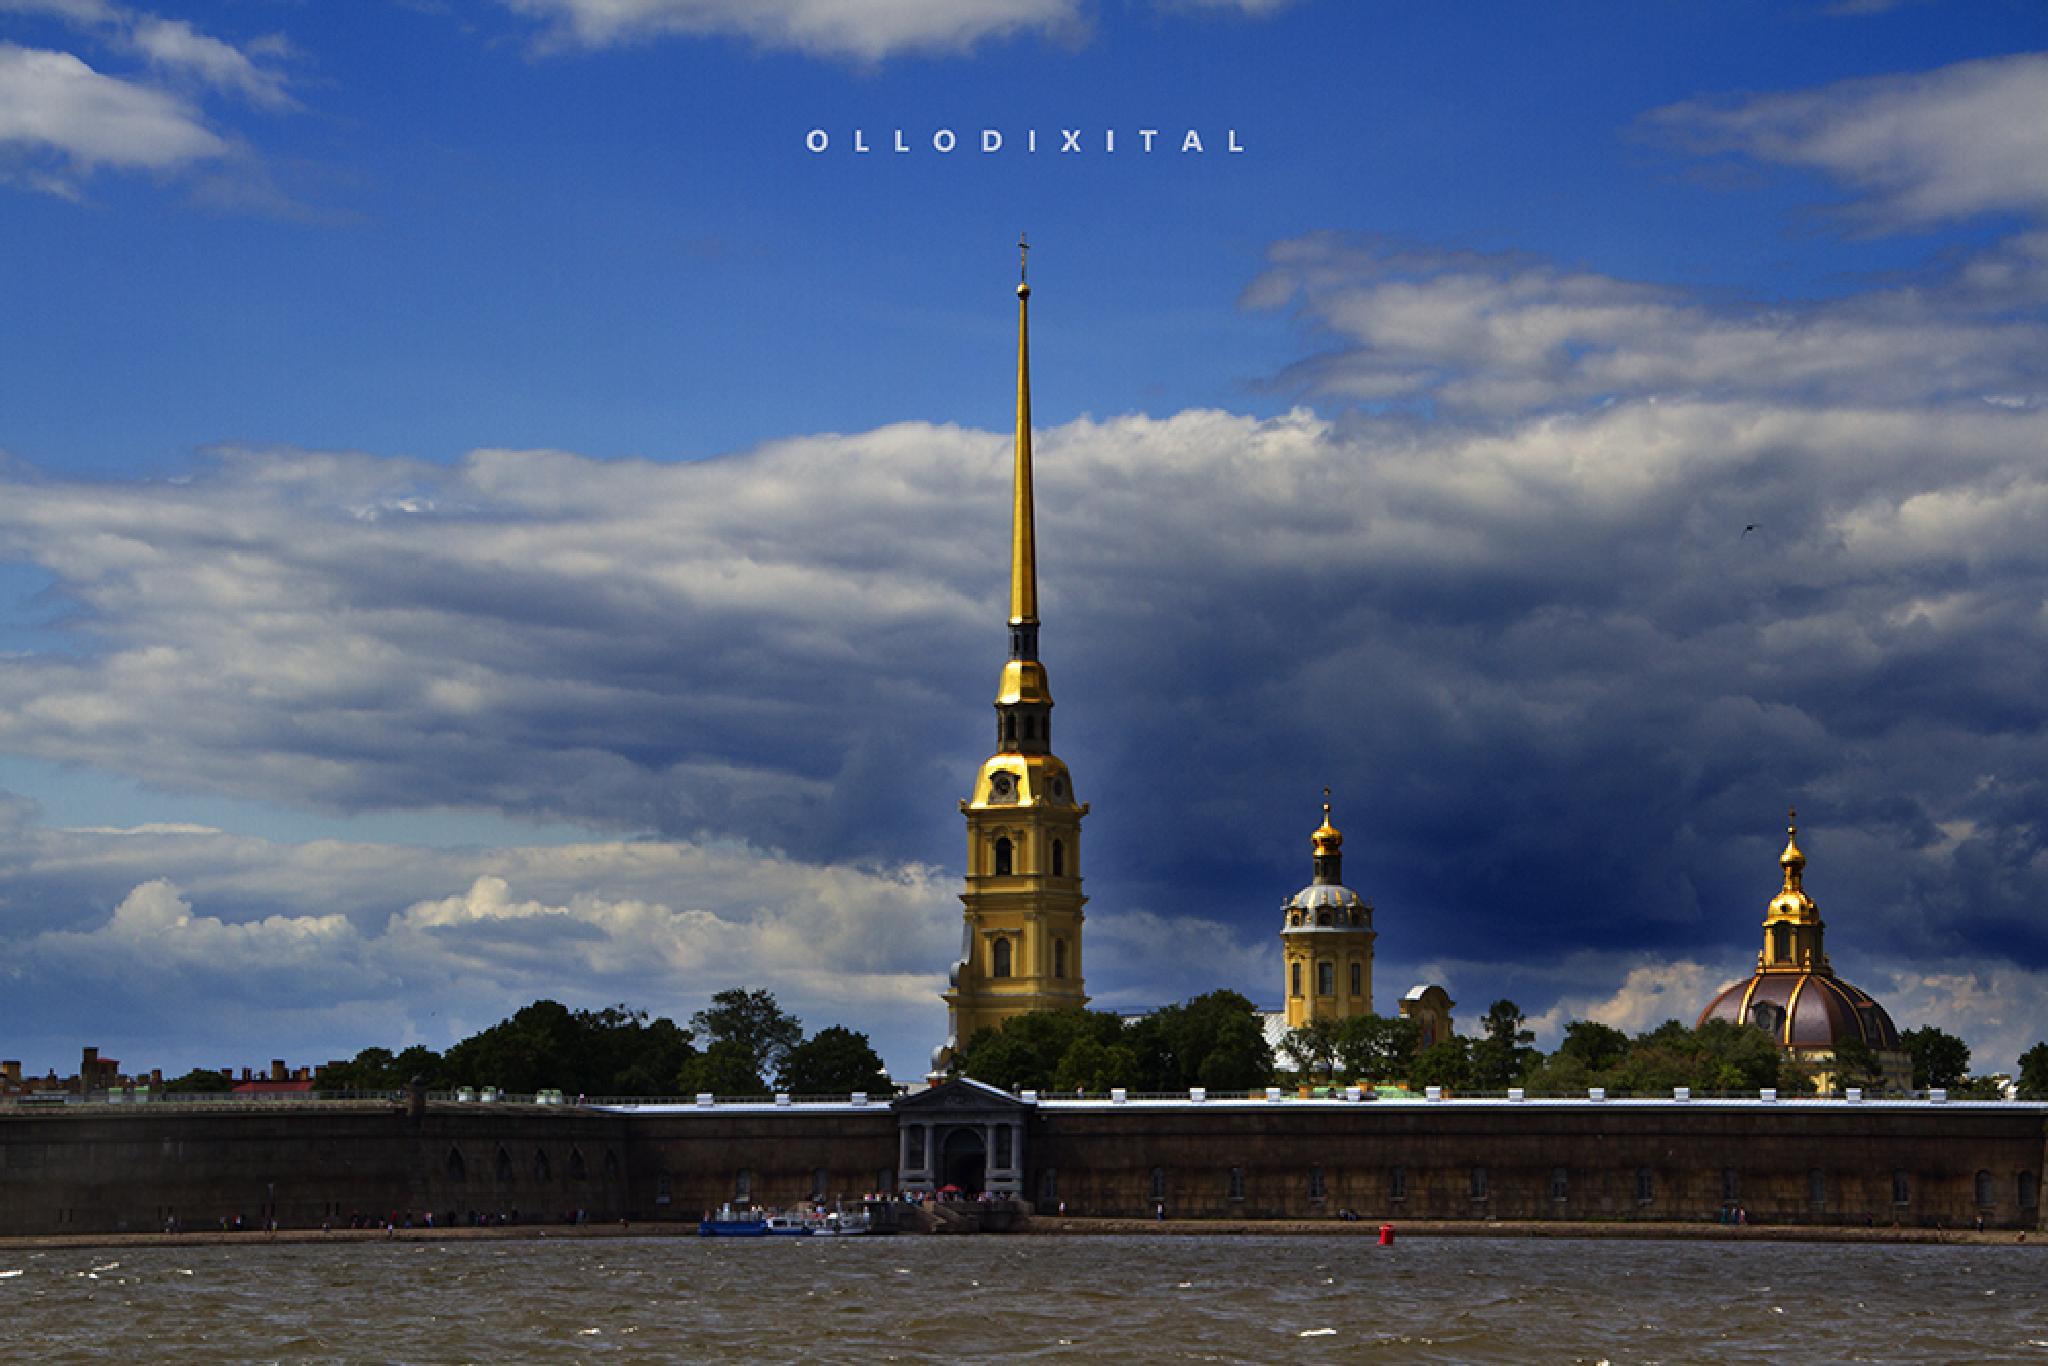 St. Petersburg by OlloDixital